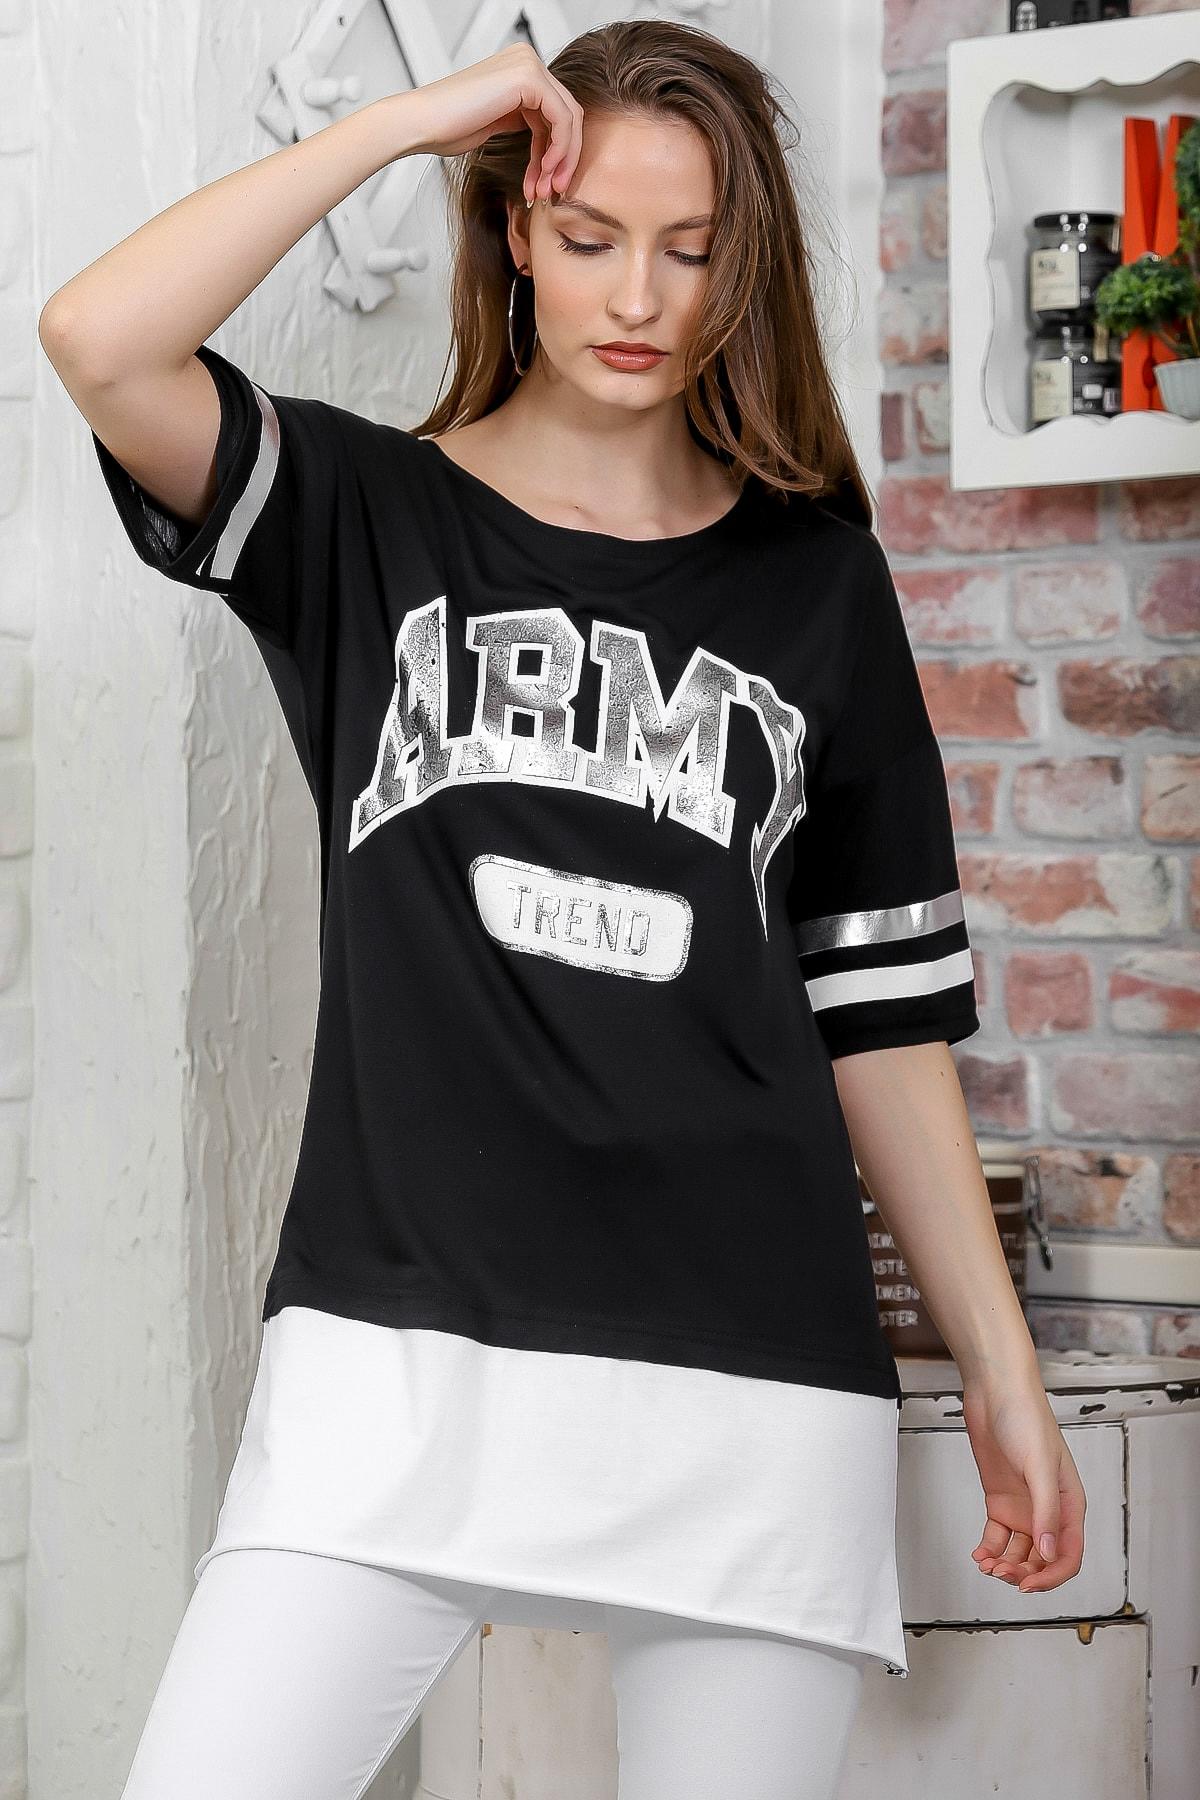 Chiccy Kadın Siyah Army Baskılı Etek Ucu Bloklu Salaş T-Shirt M10010300TS98264